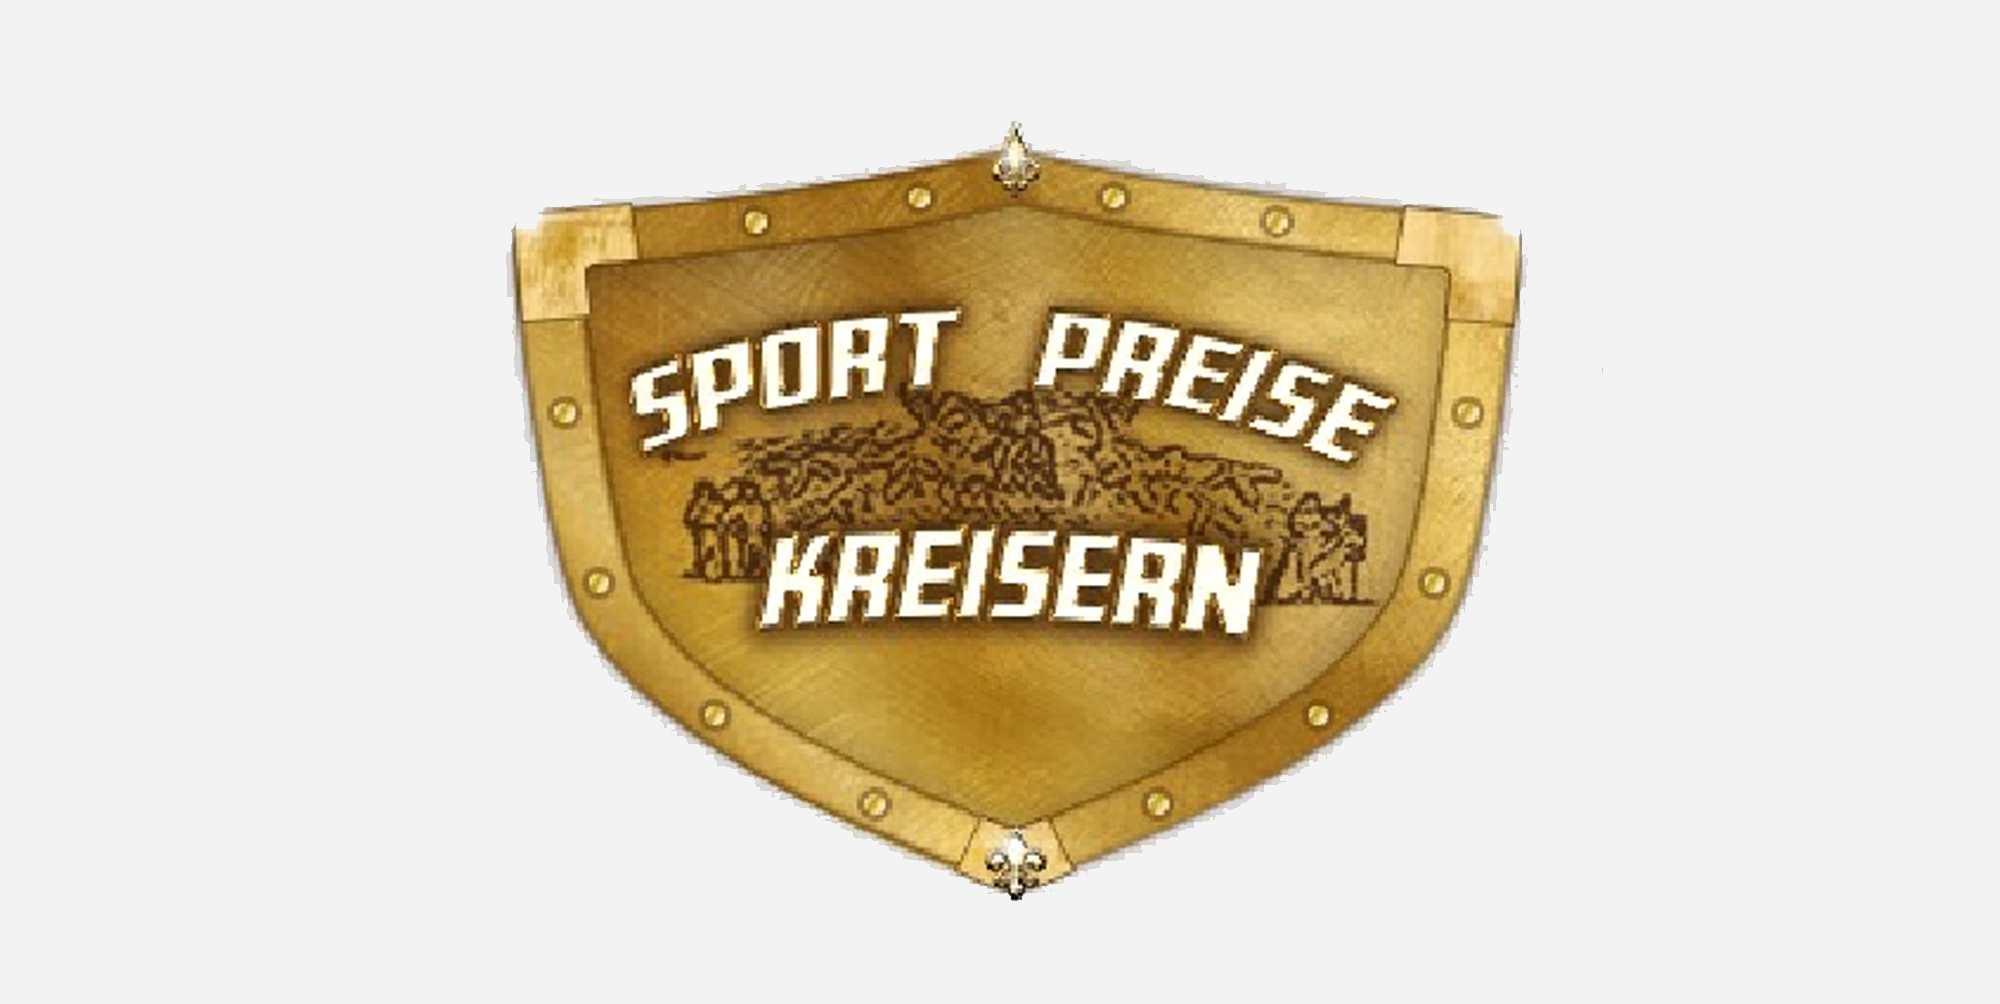 Sport Preise